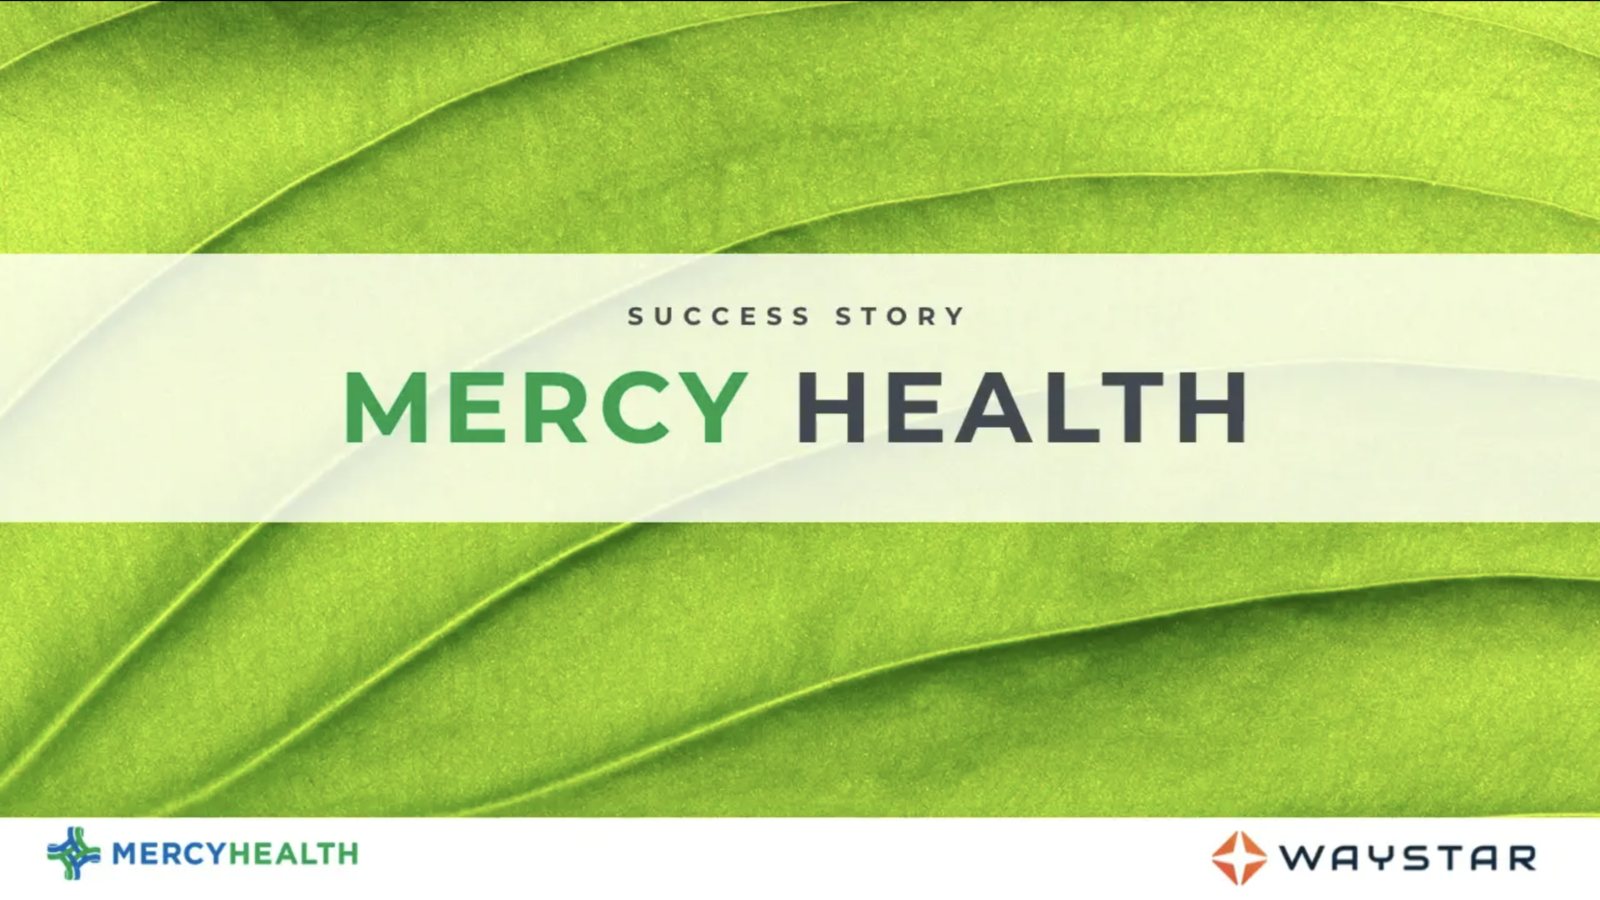 Success story: Mercy Health